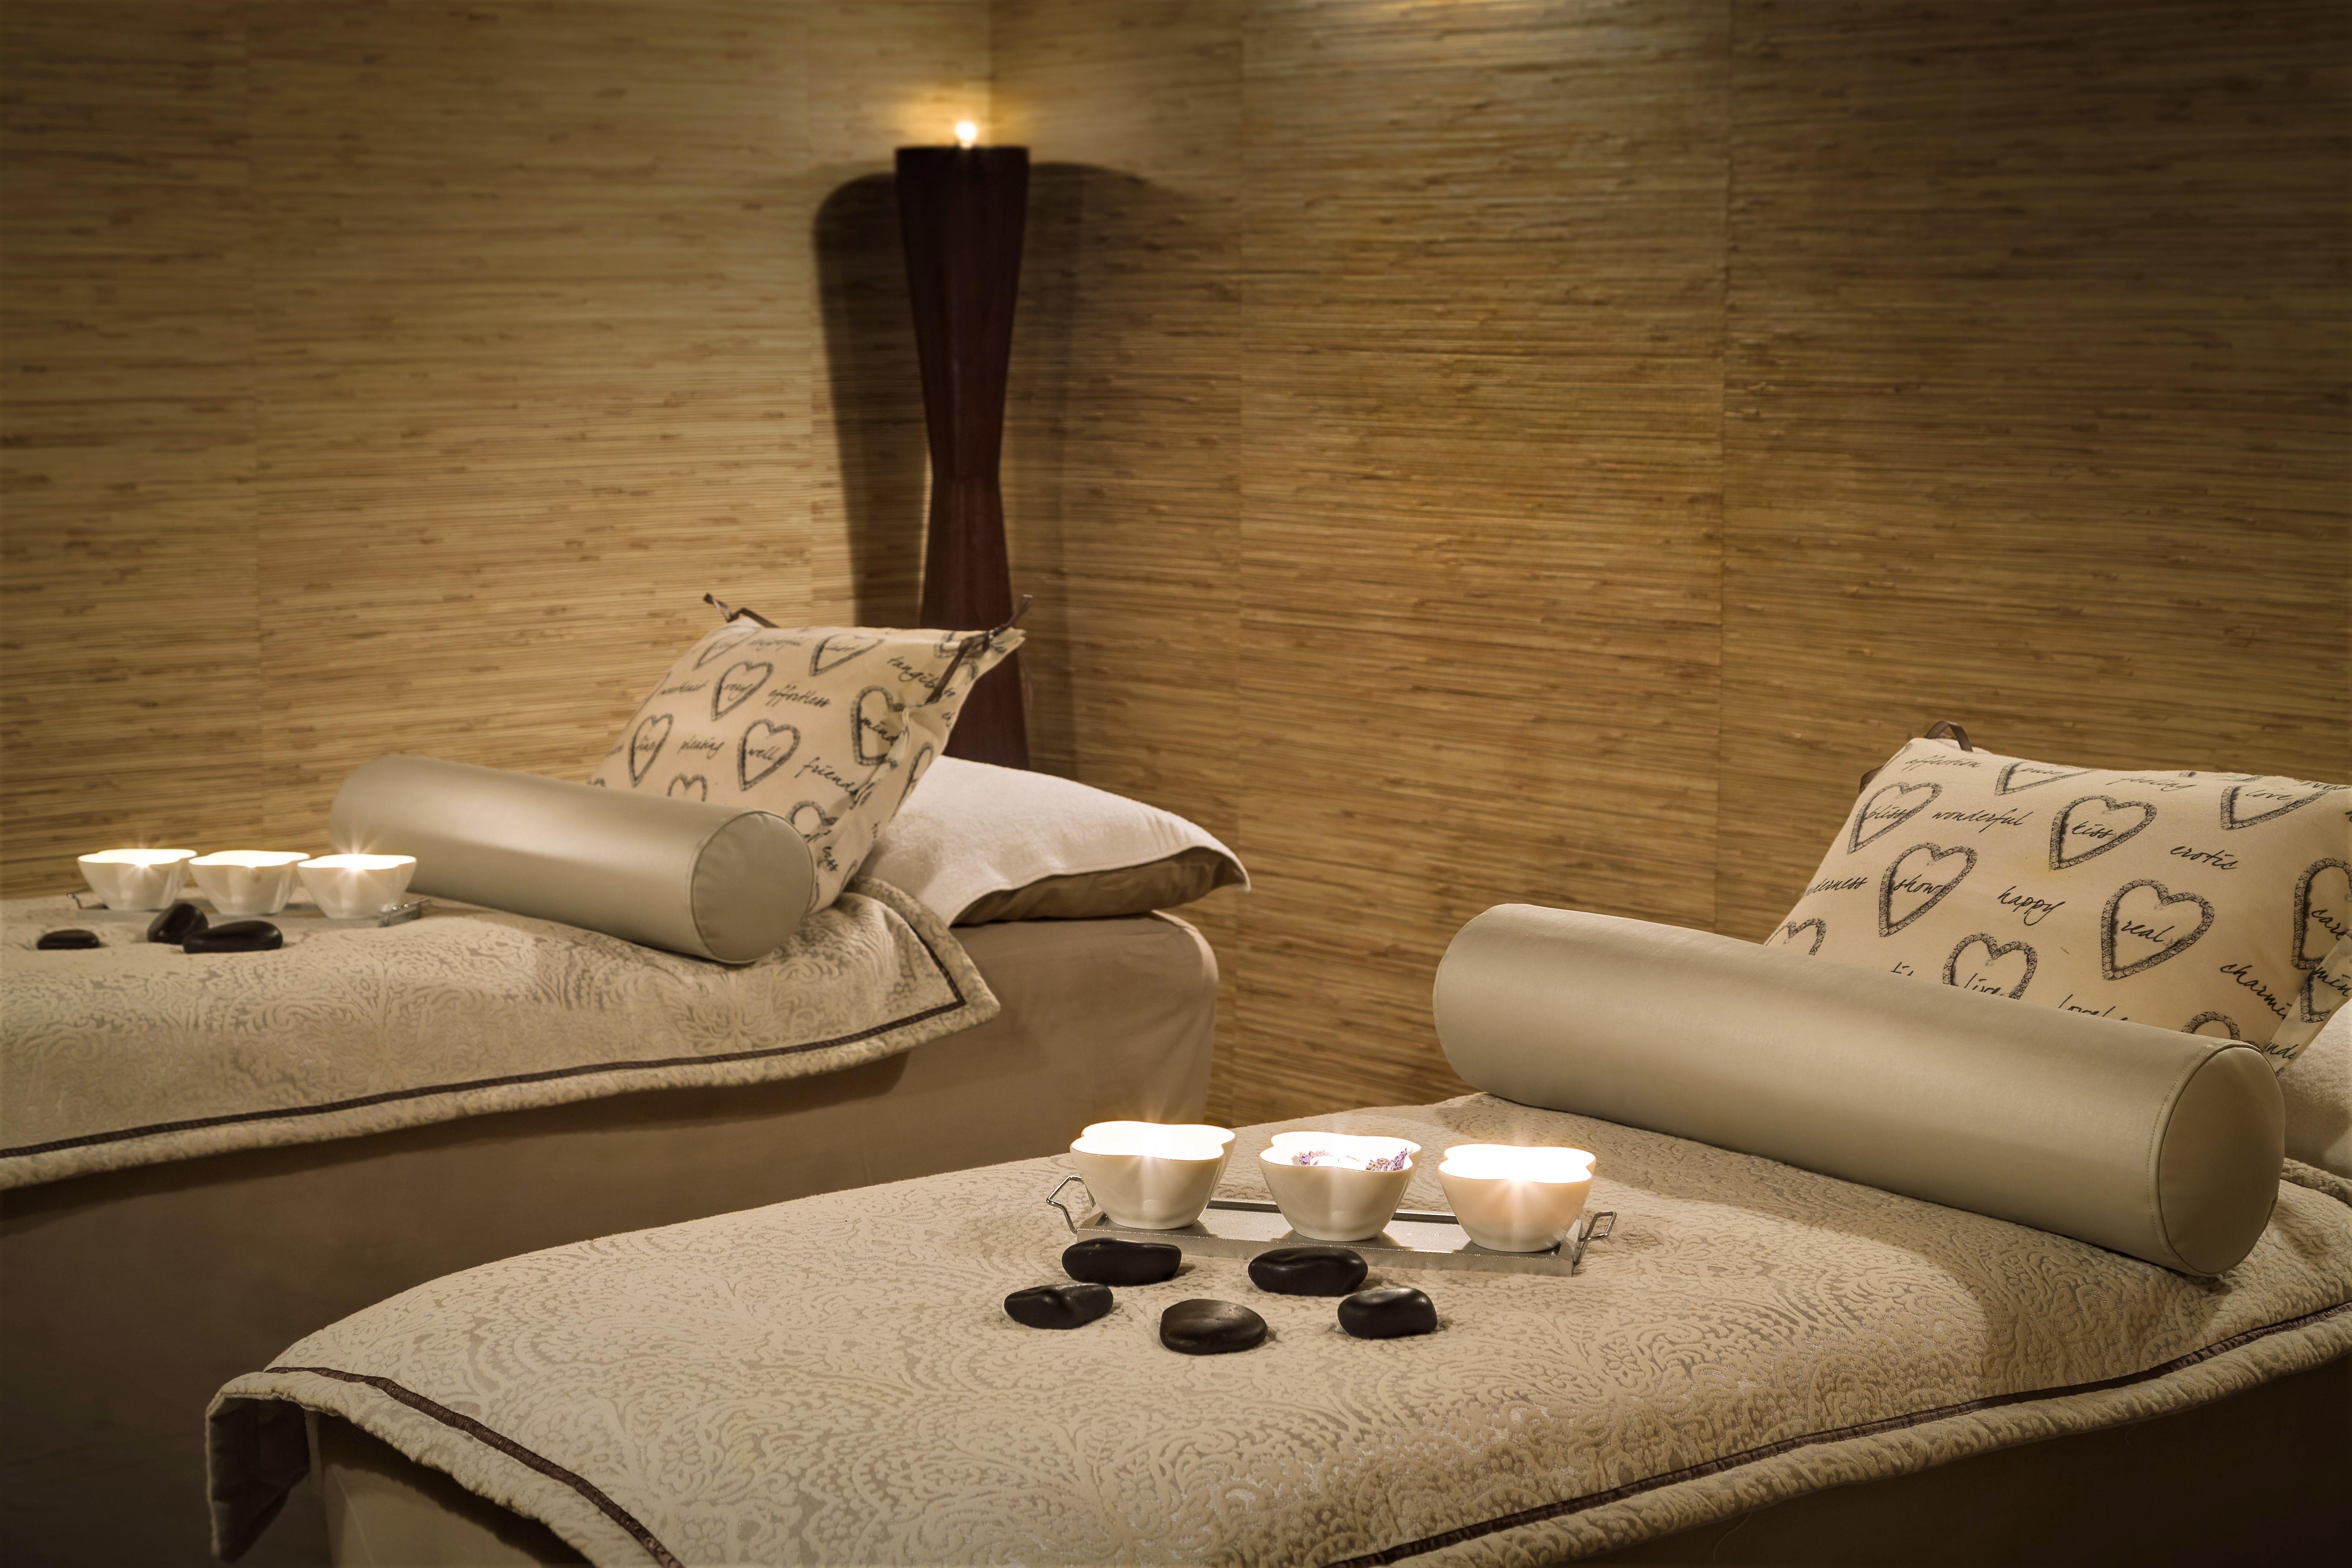 Luxury Spa Treatments